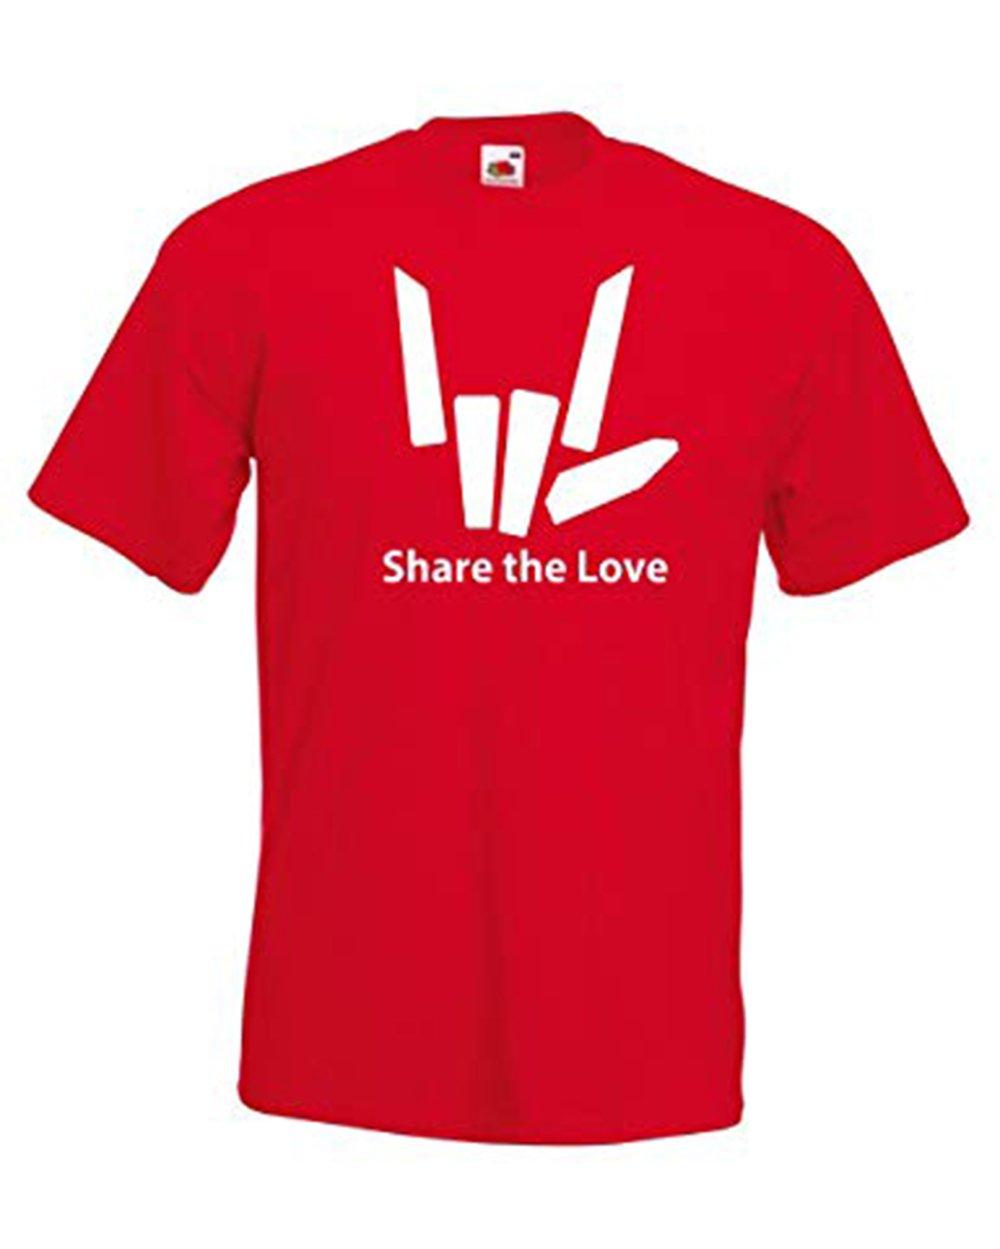 Unisex Boys Girls Share The Love Logo Short Sleeved Cotton Top T-Shirt (3-13 Years)